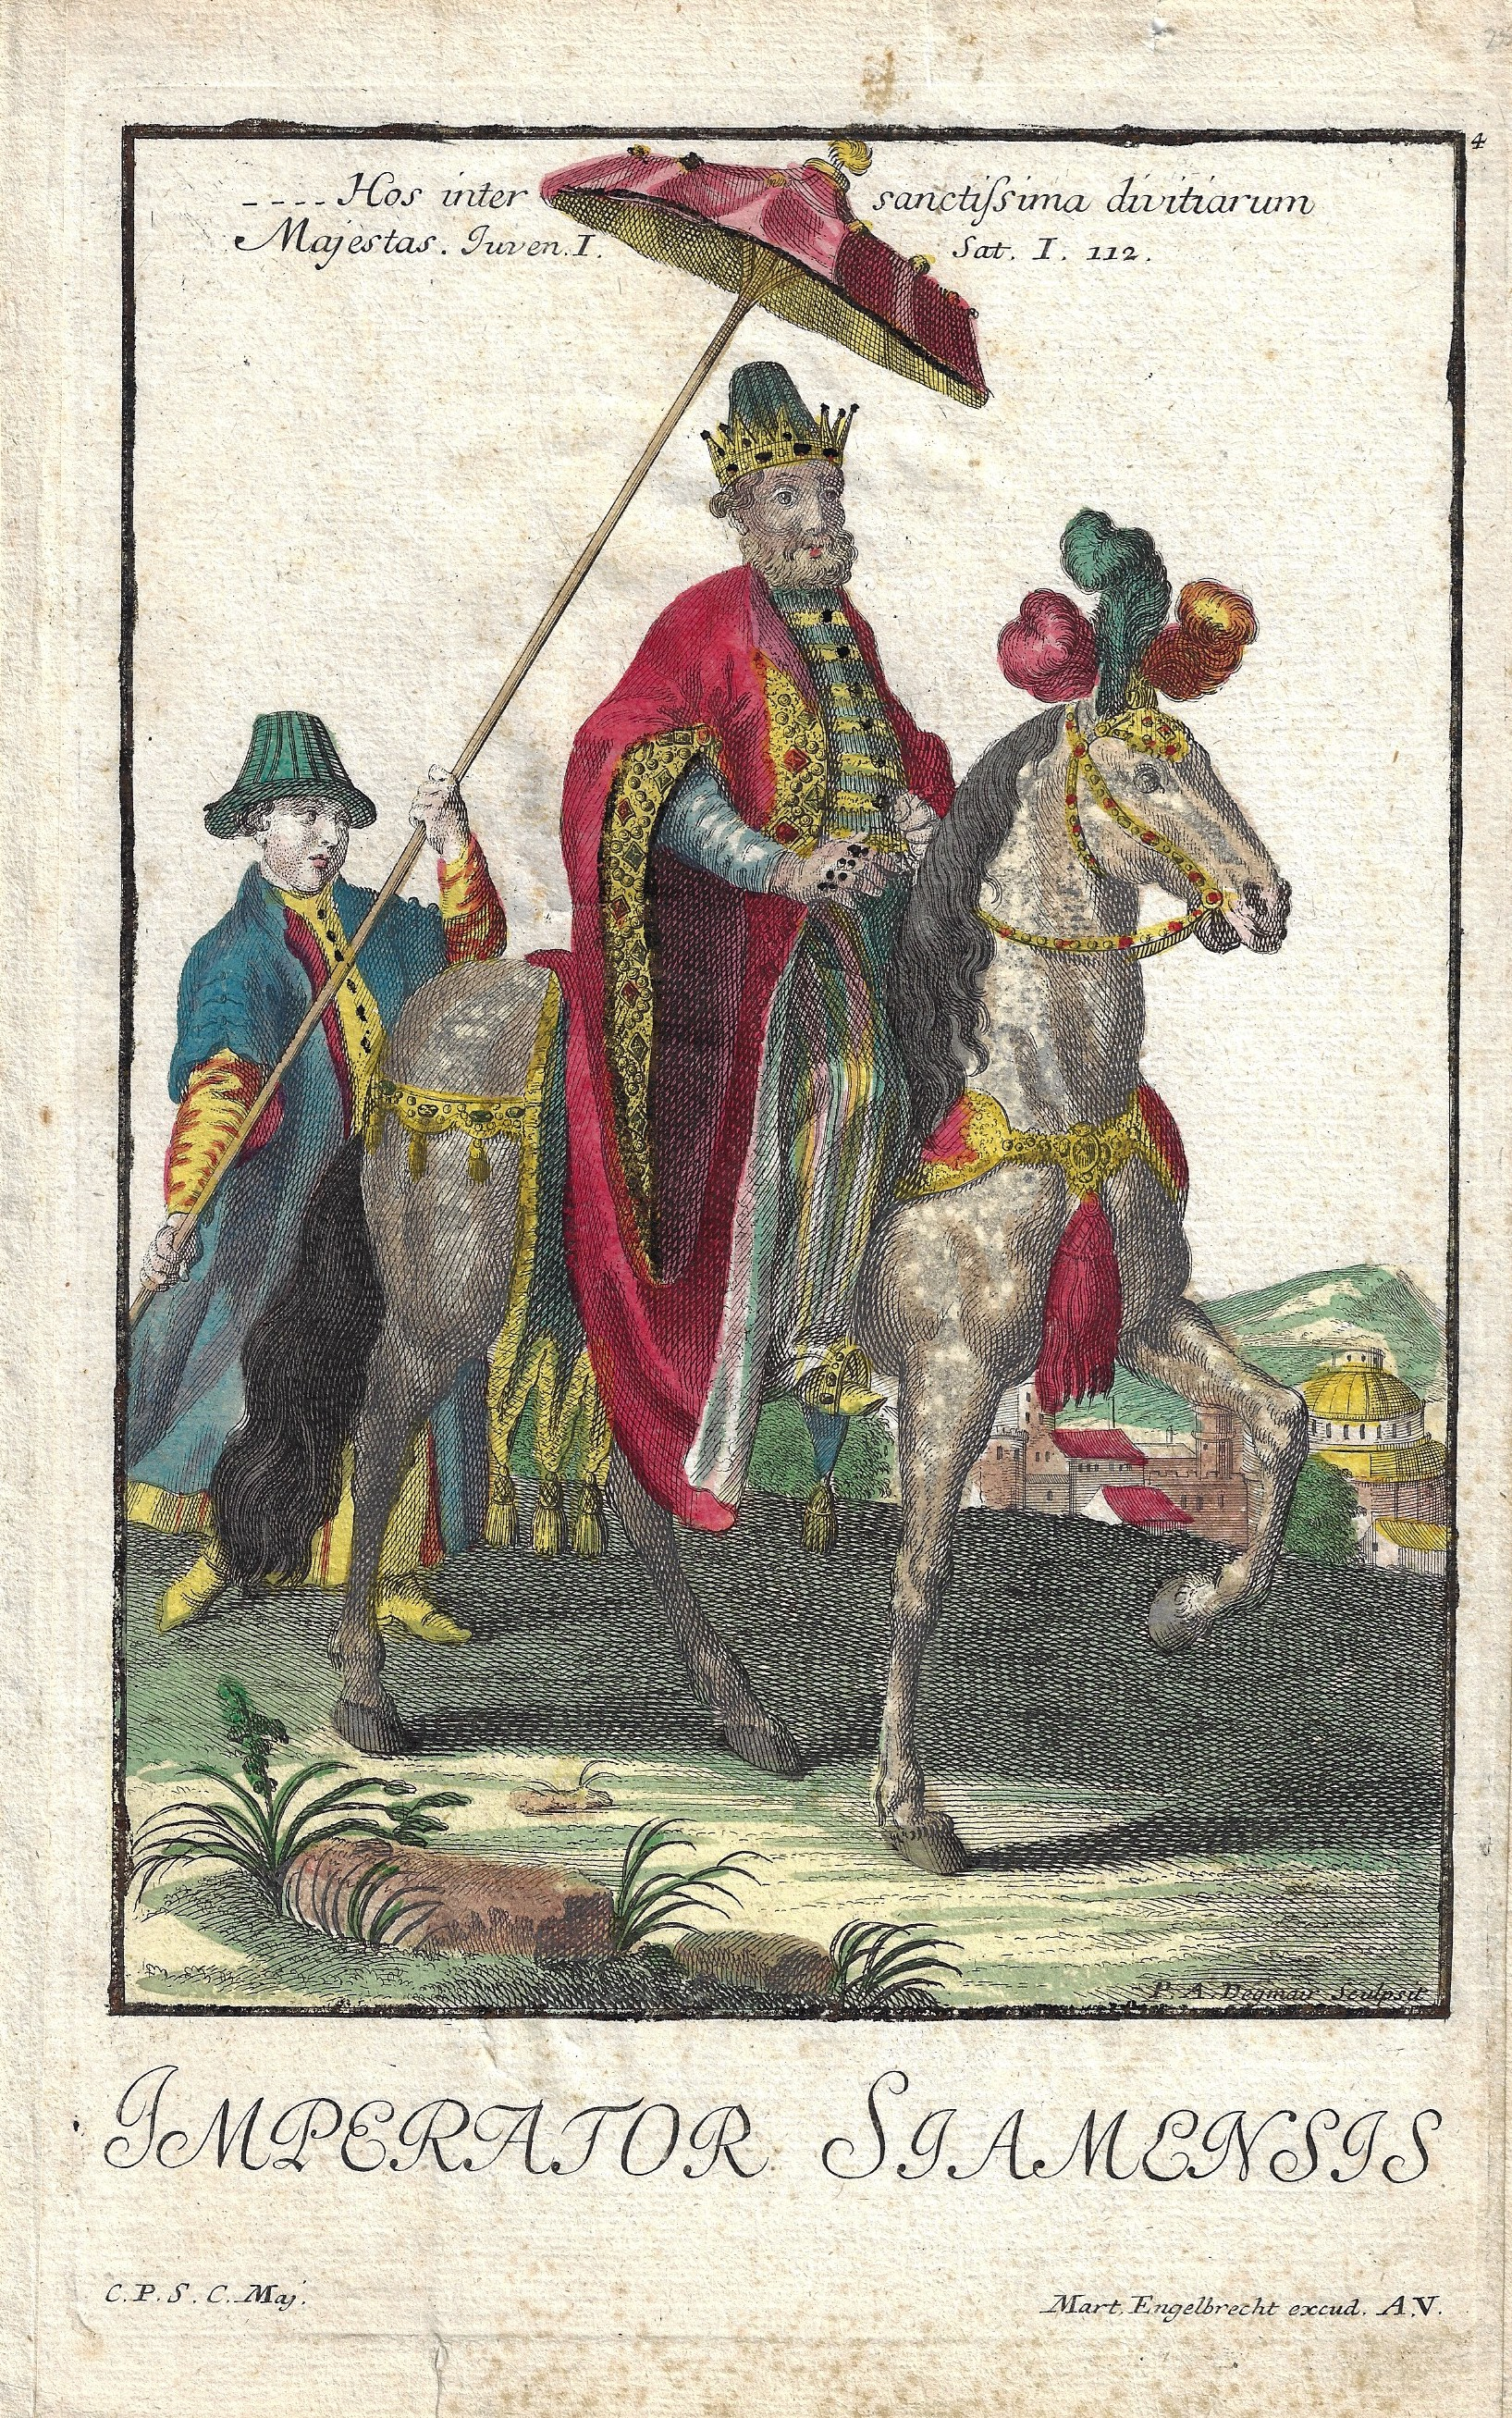 Engelbrecht Martin Imperator Siamensis /  Hos inter sanctissima divitiarum Majestas. Juven. I. Sat. I. 112.